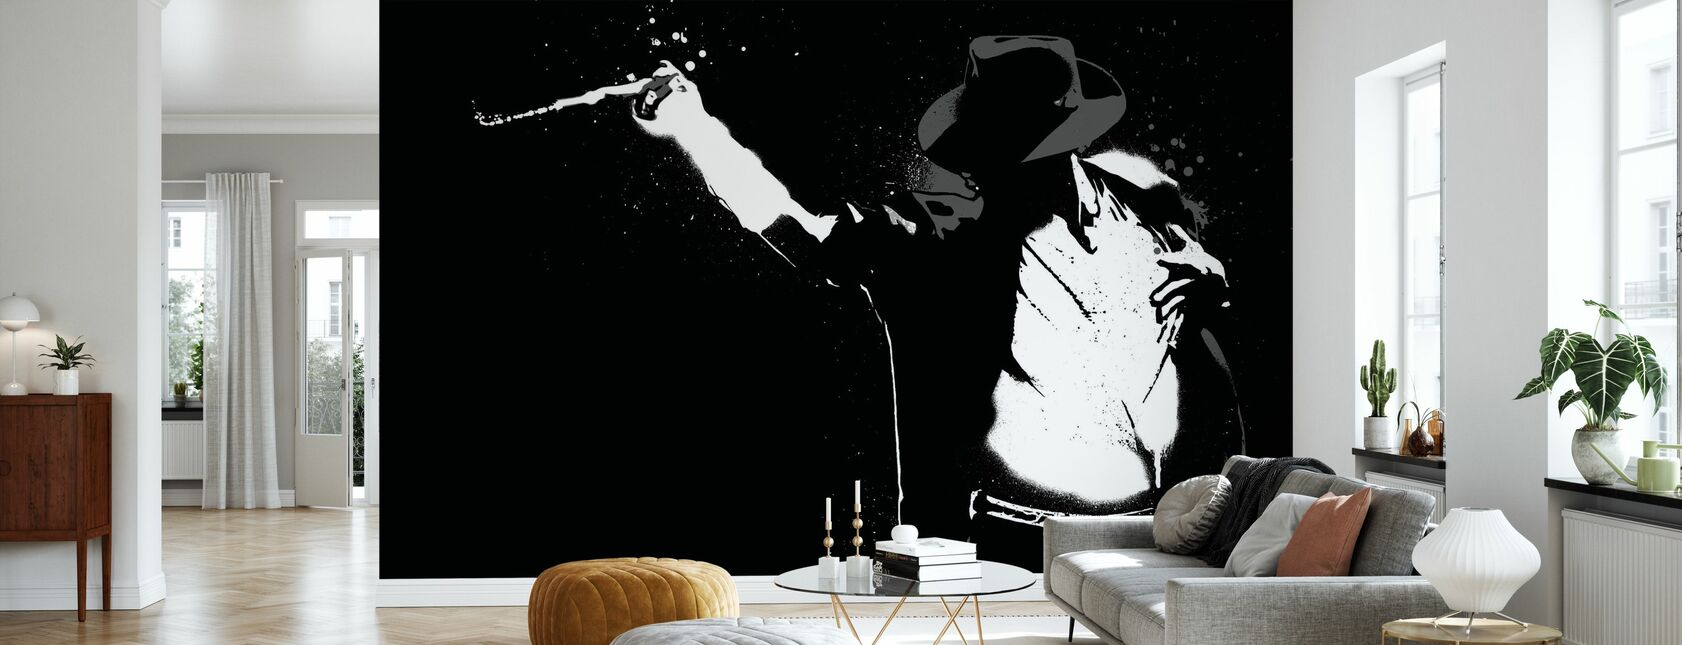 Jackson - Wallpaper - Living Room